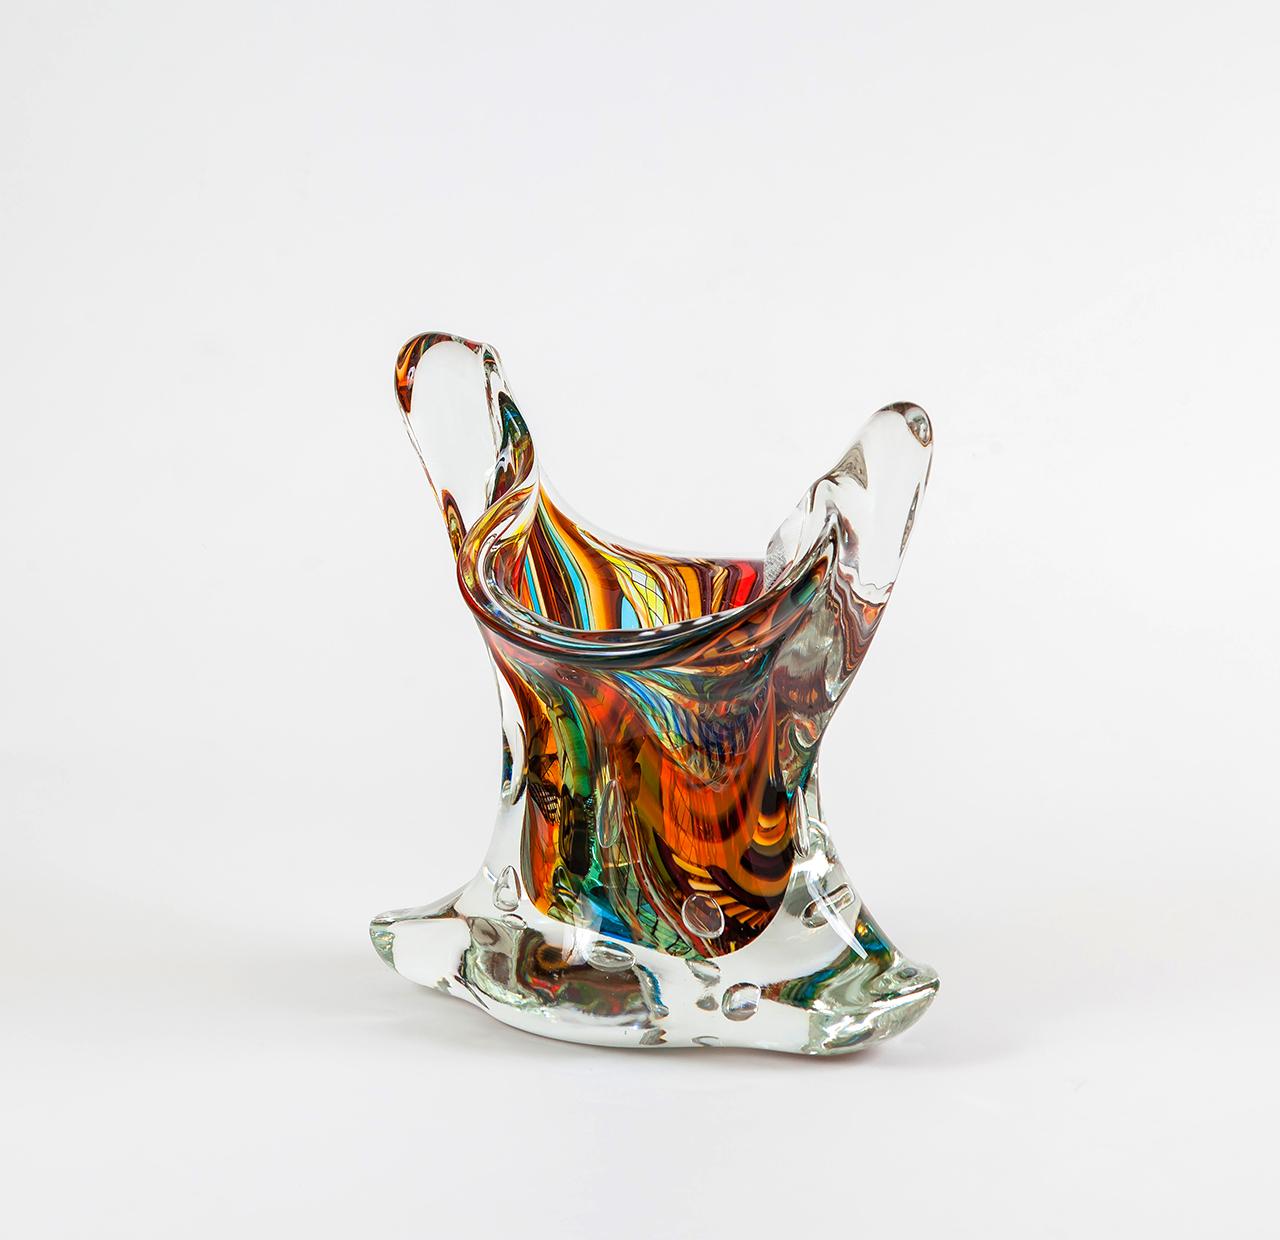 vaso-vetro-murano-schiavon-art-team